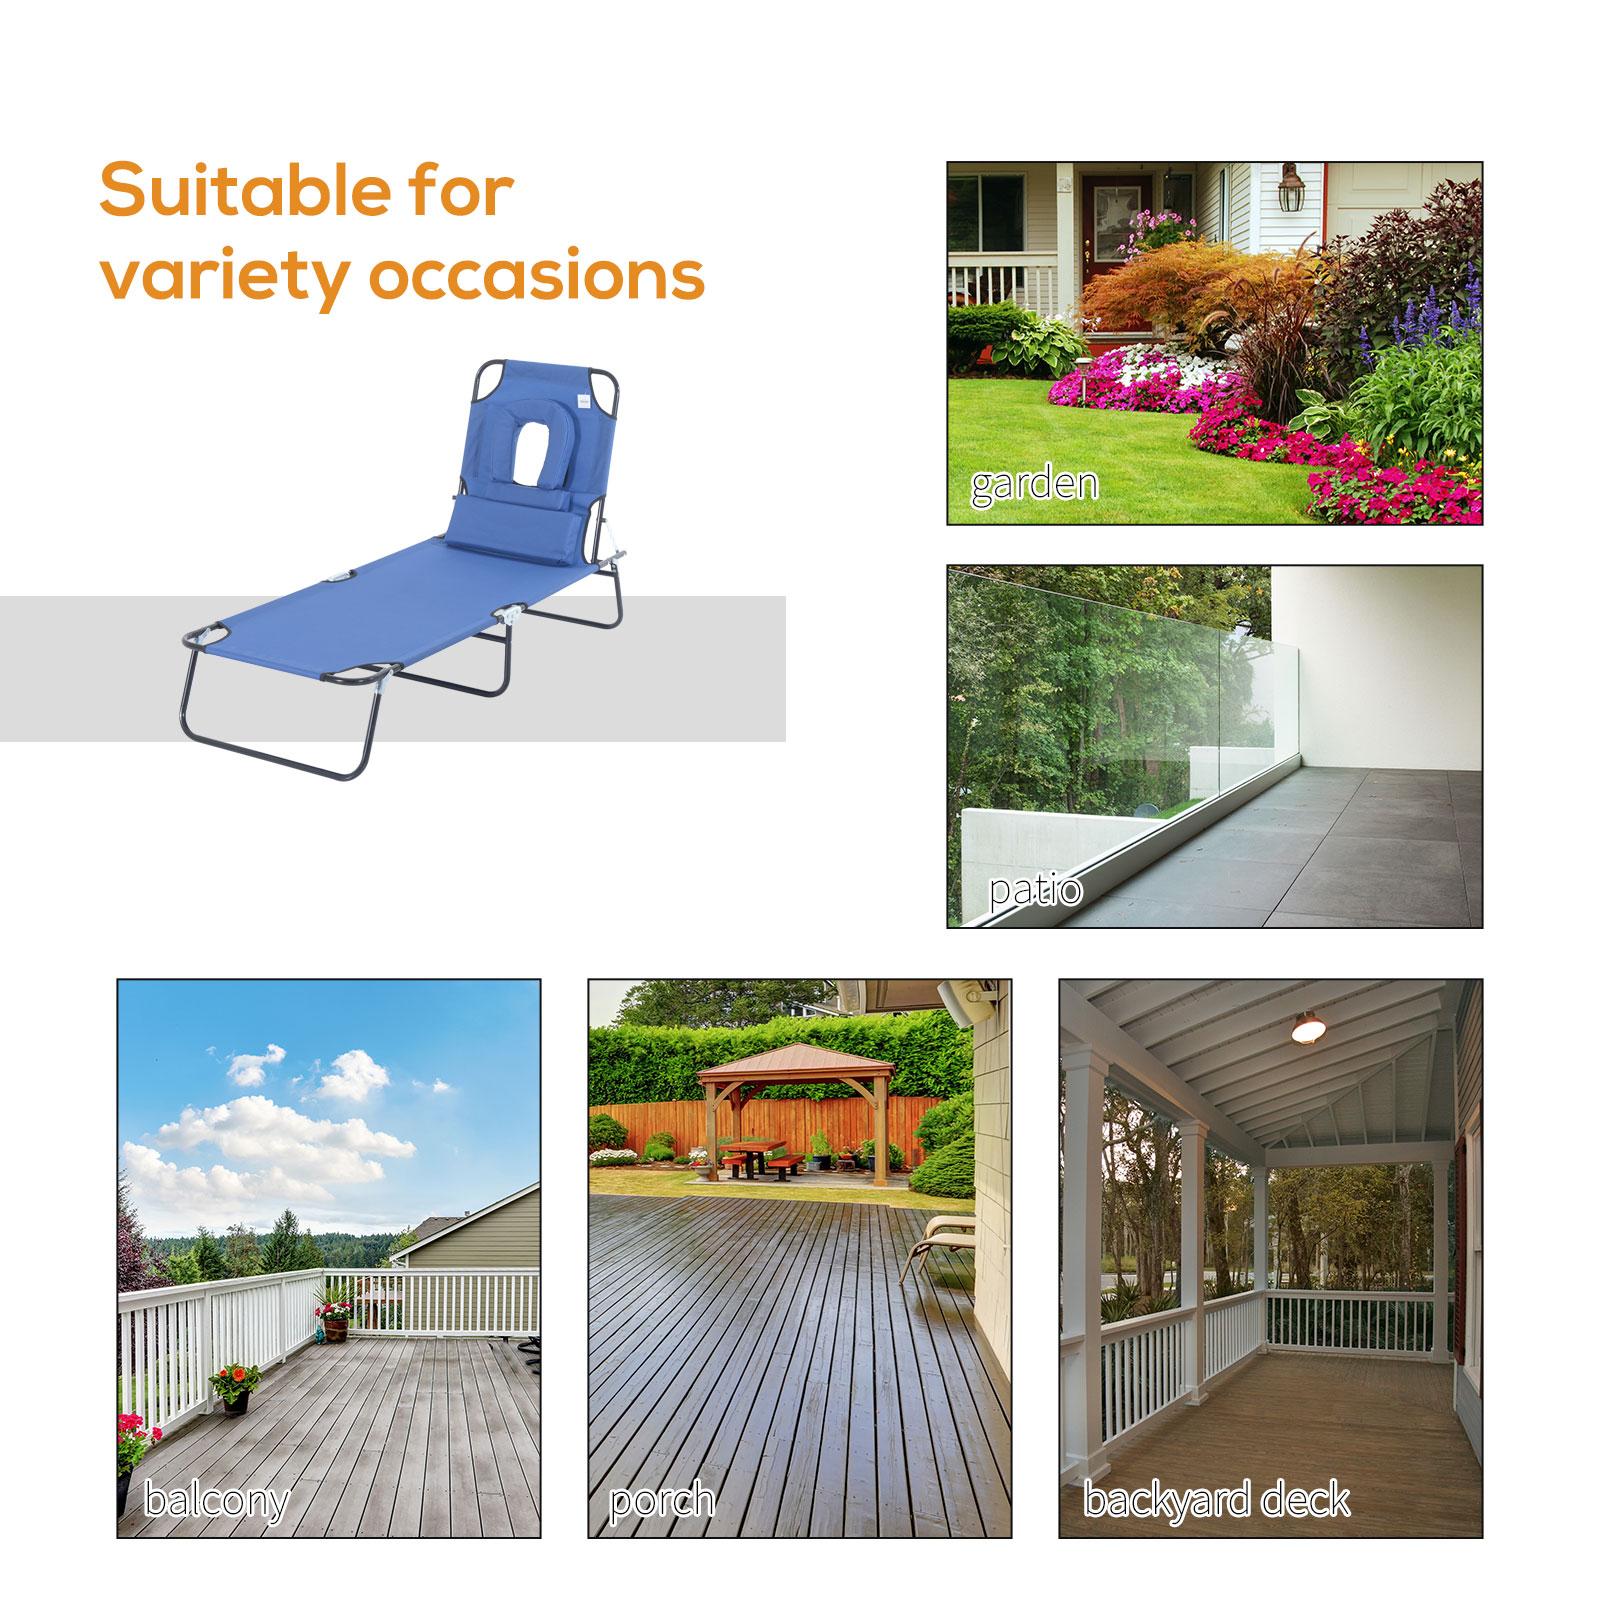 miniatura 15 - Silla Reclinable Plegable Tumbona Reclinable Jardín Al Aire Libre Portátil Asiento Cama